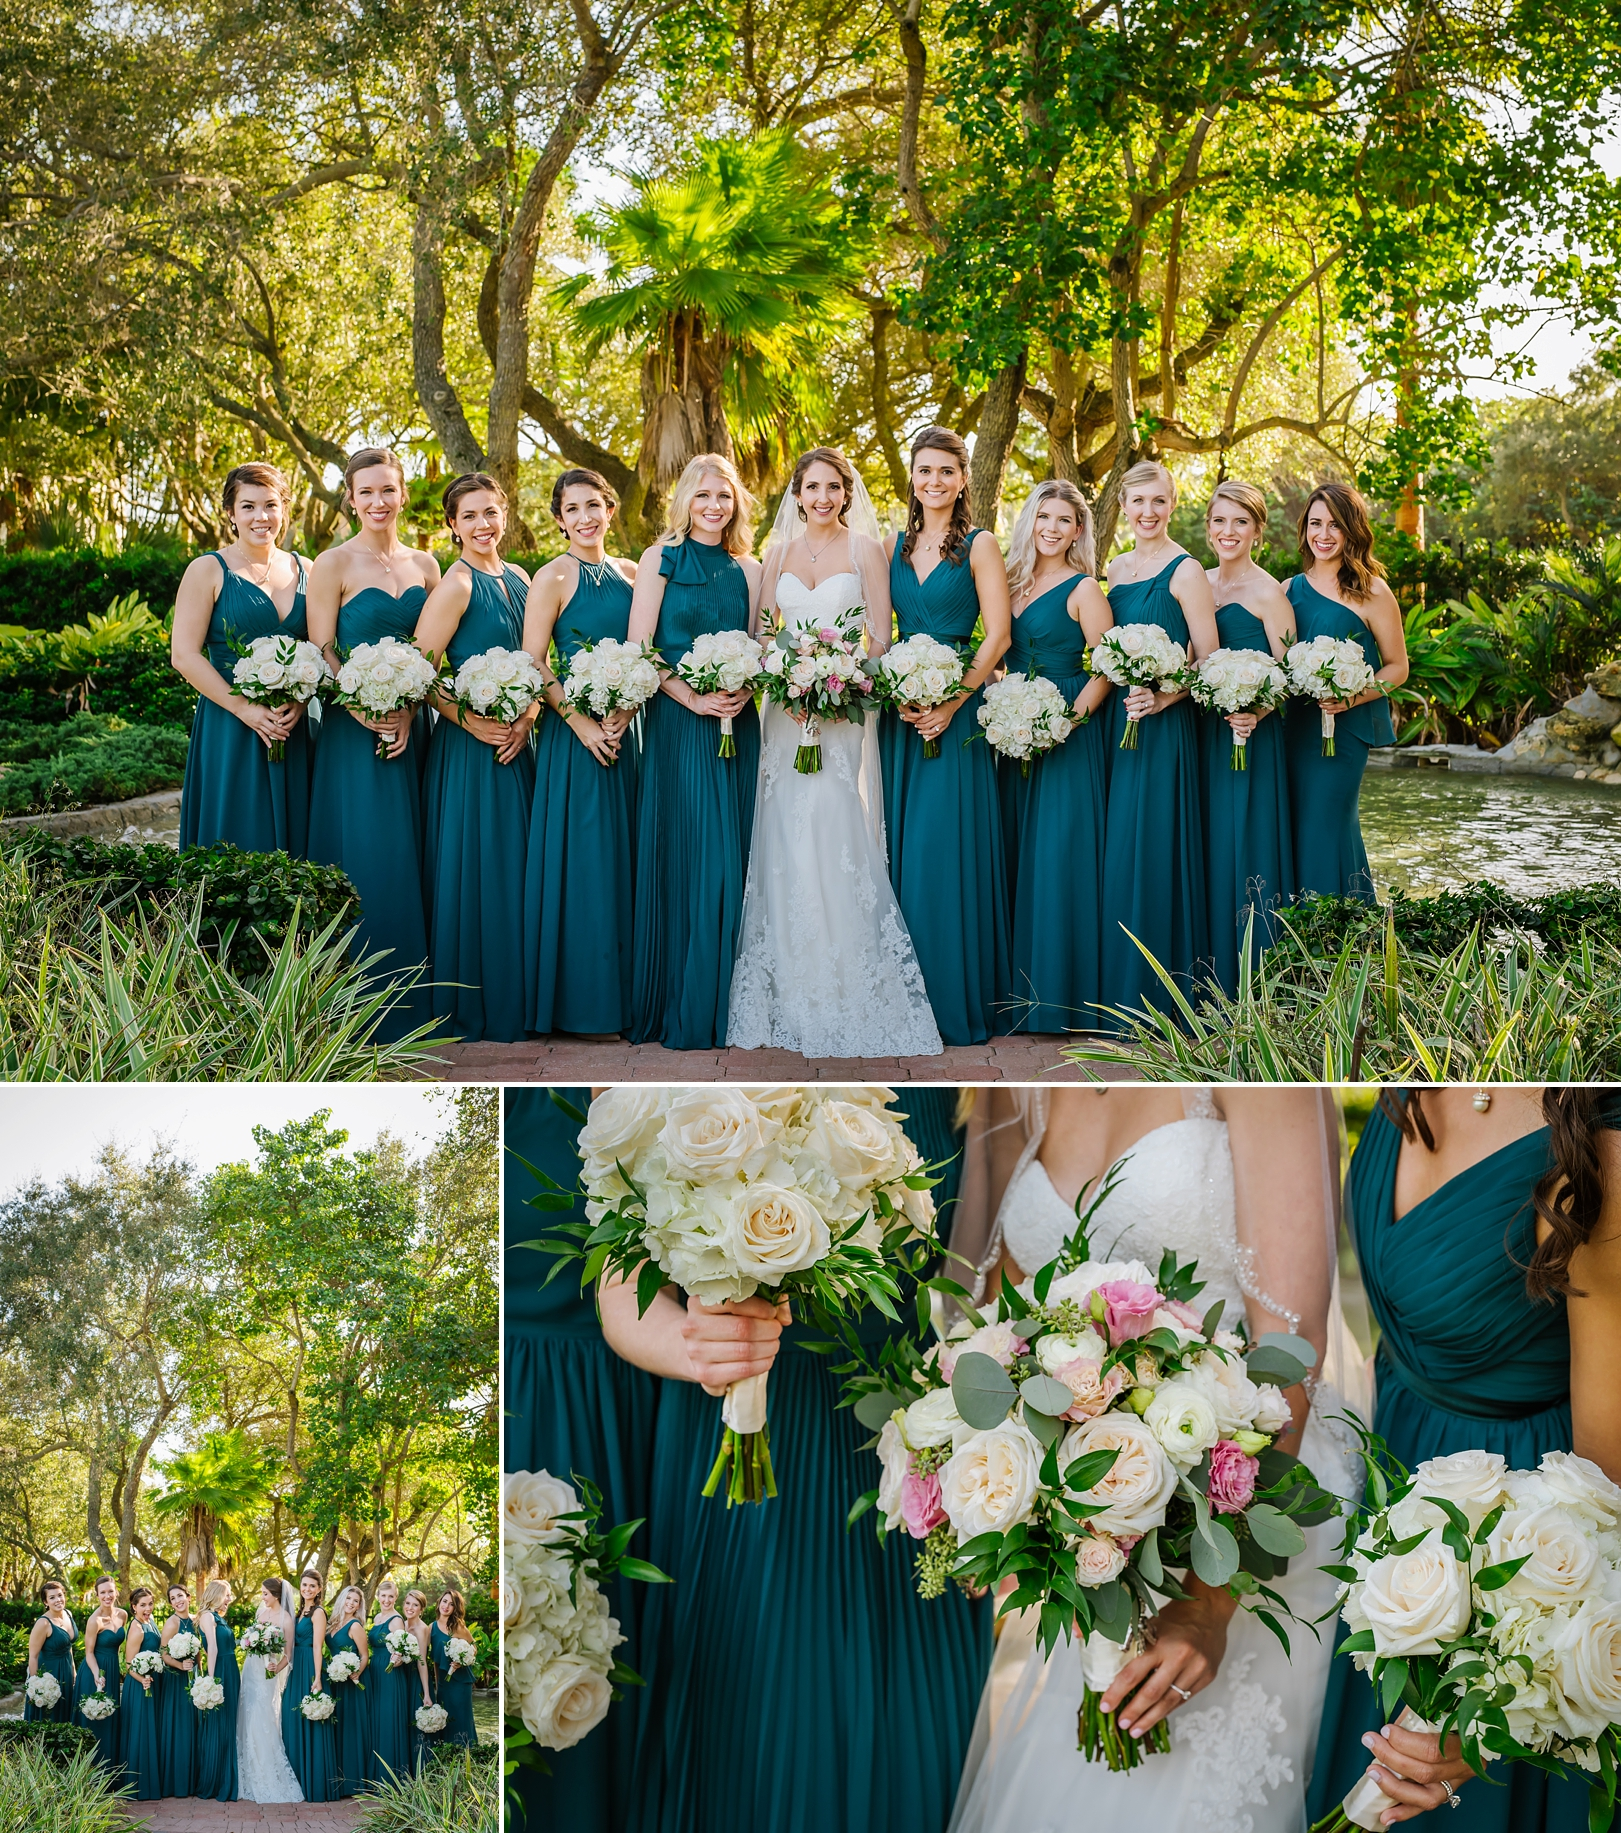 miami-wedding-photography-ashlee-hamon-elegant-vintage-antique-wedding_0012.jpg